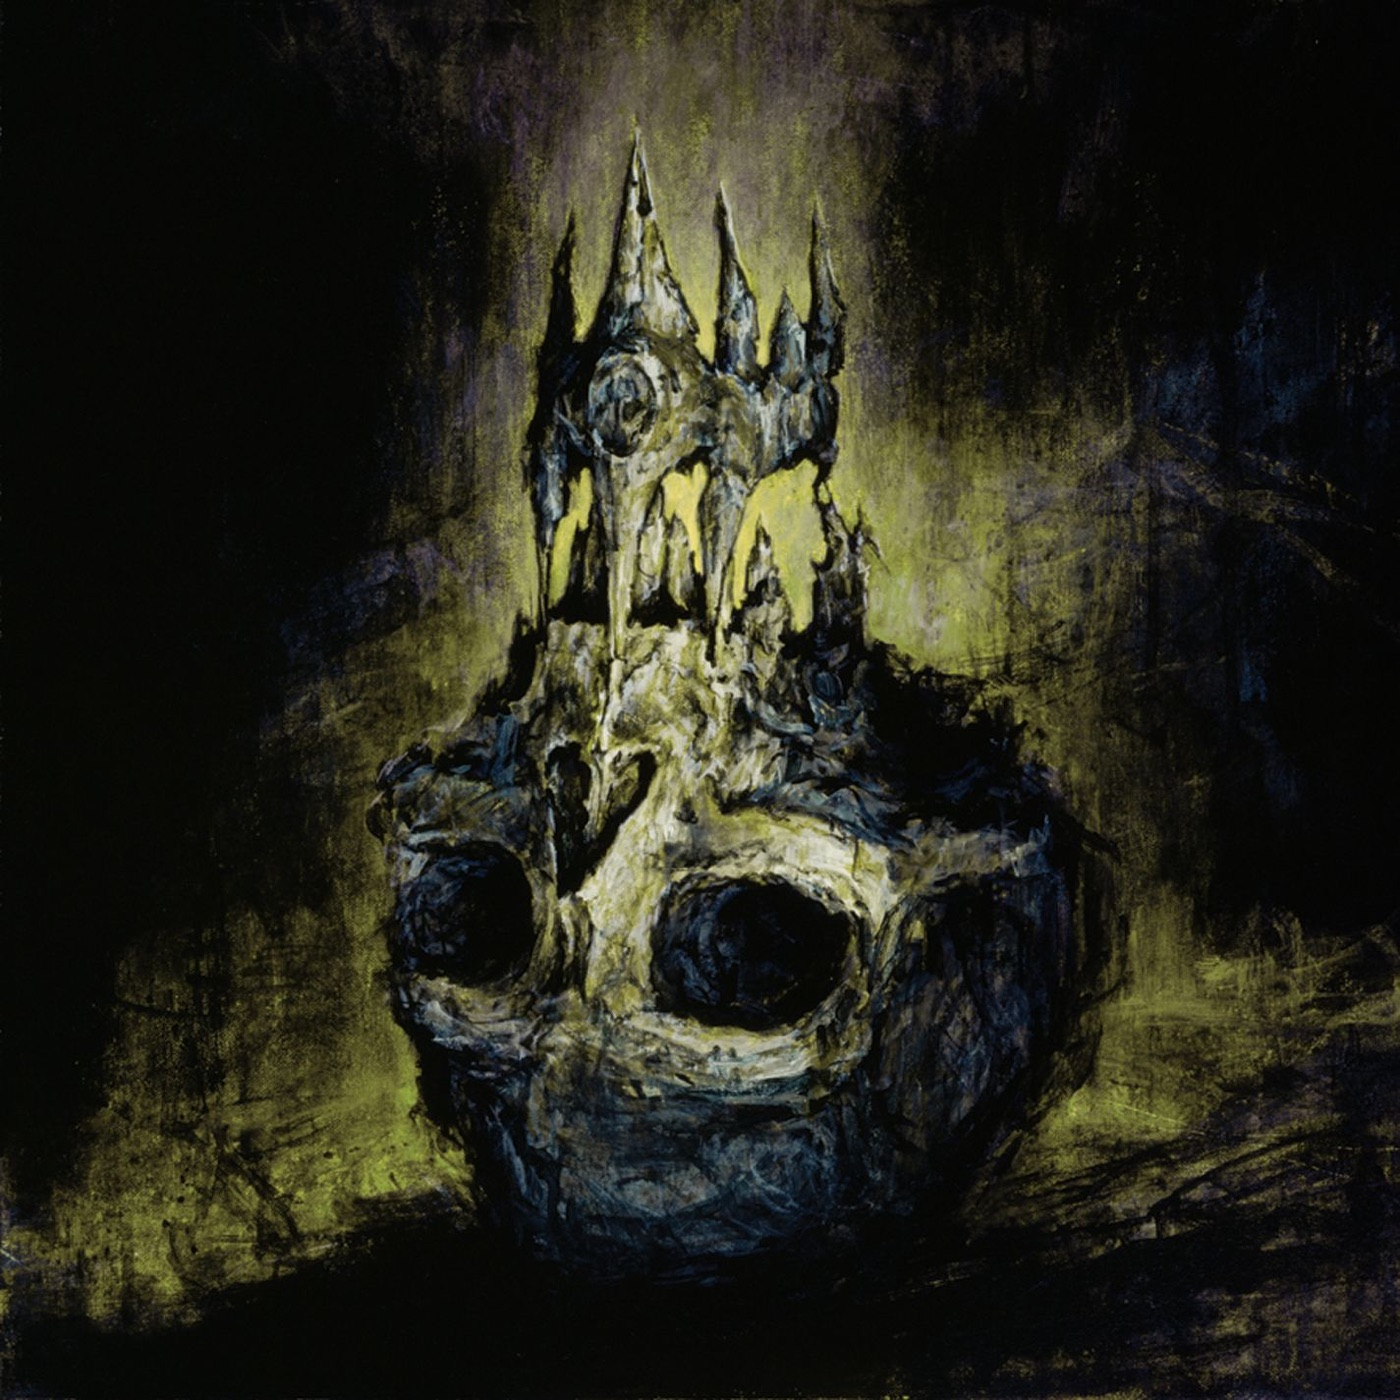 The Devil Wears Prada - Dead Throne (2011)